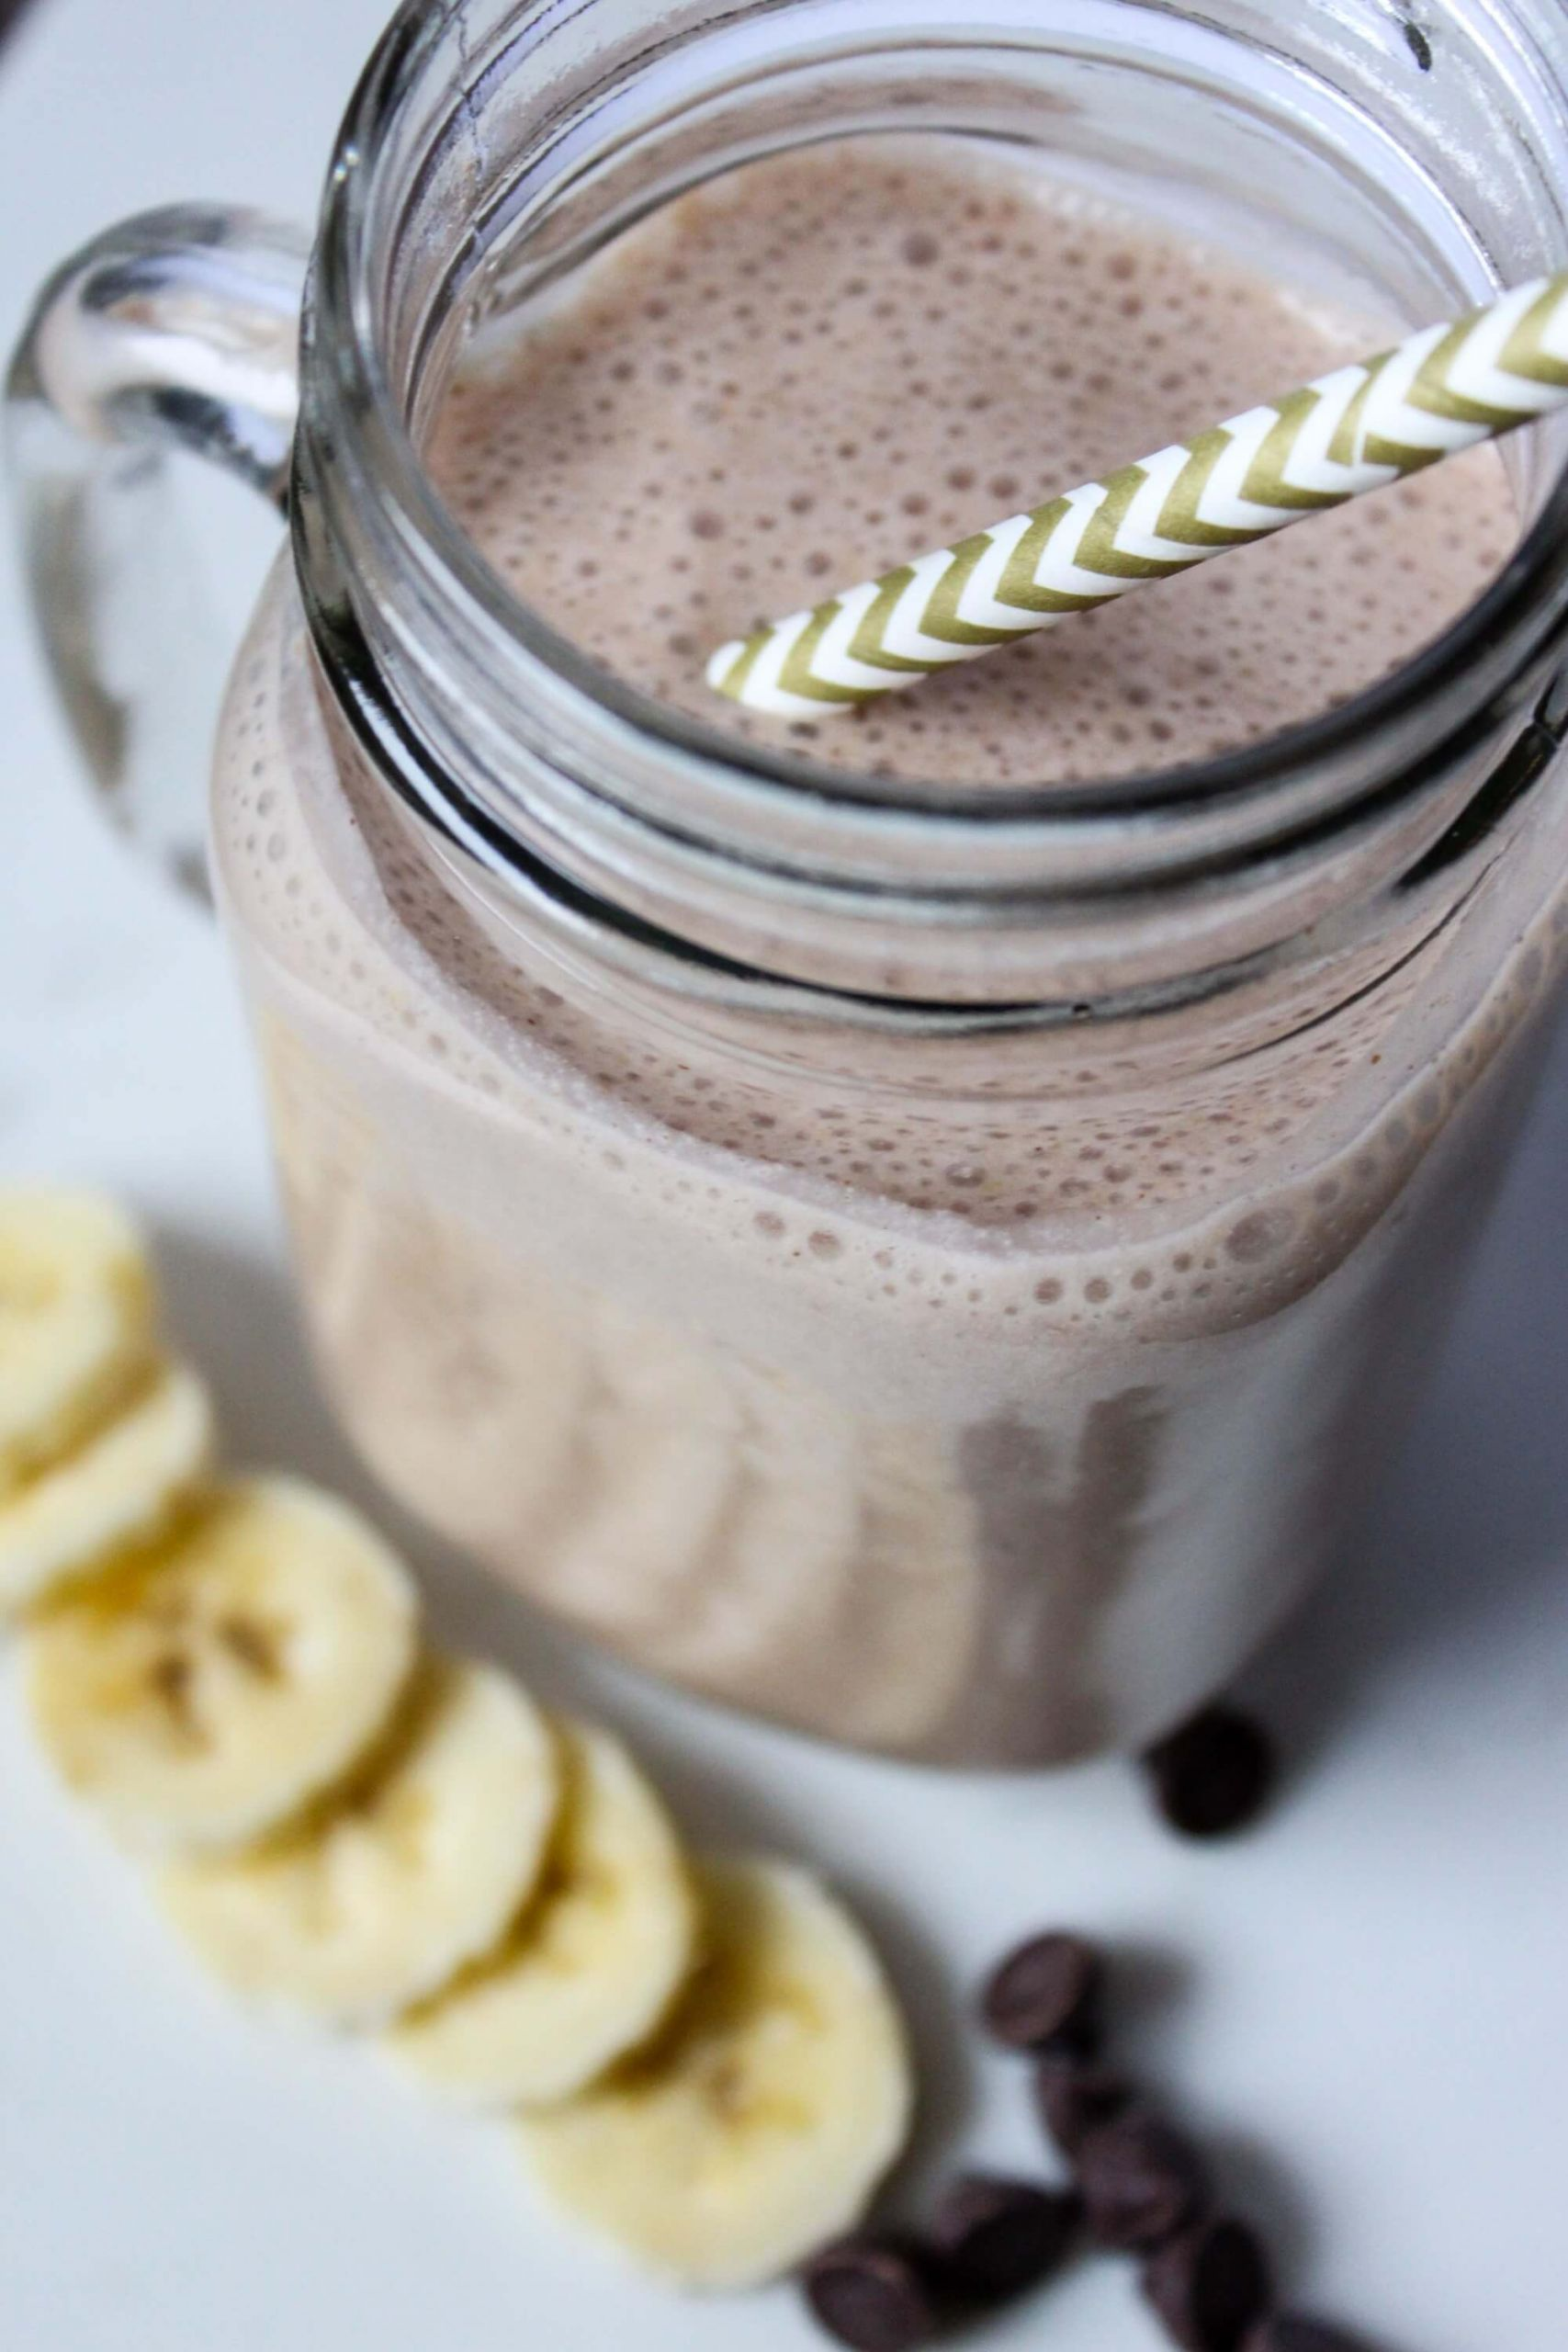 Vegan Protein Smoothie Recipes  17 Tasty Vegan Protein Smoothie Recipes for Weight Loss